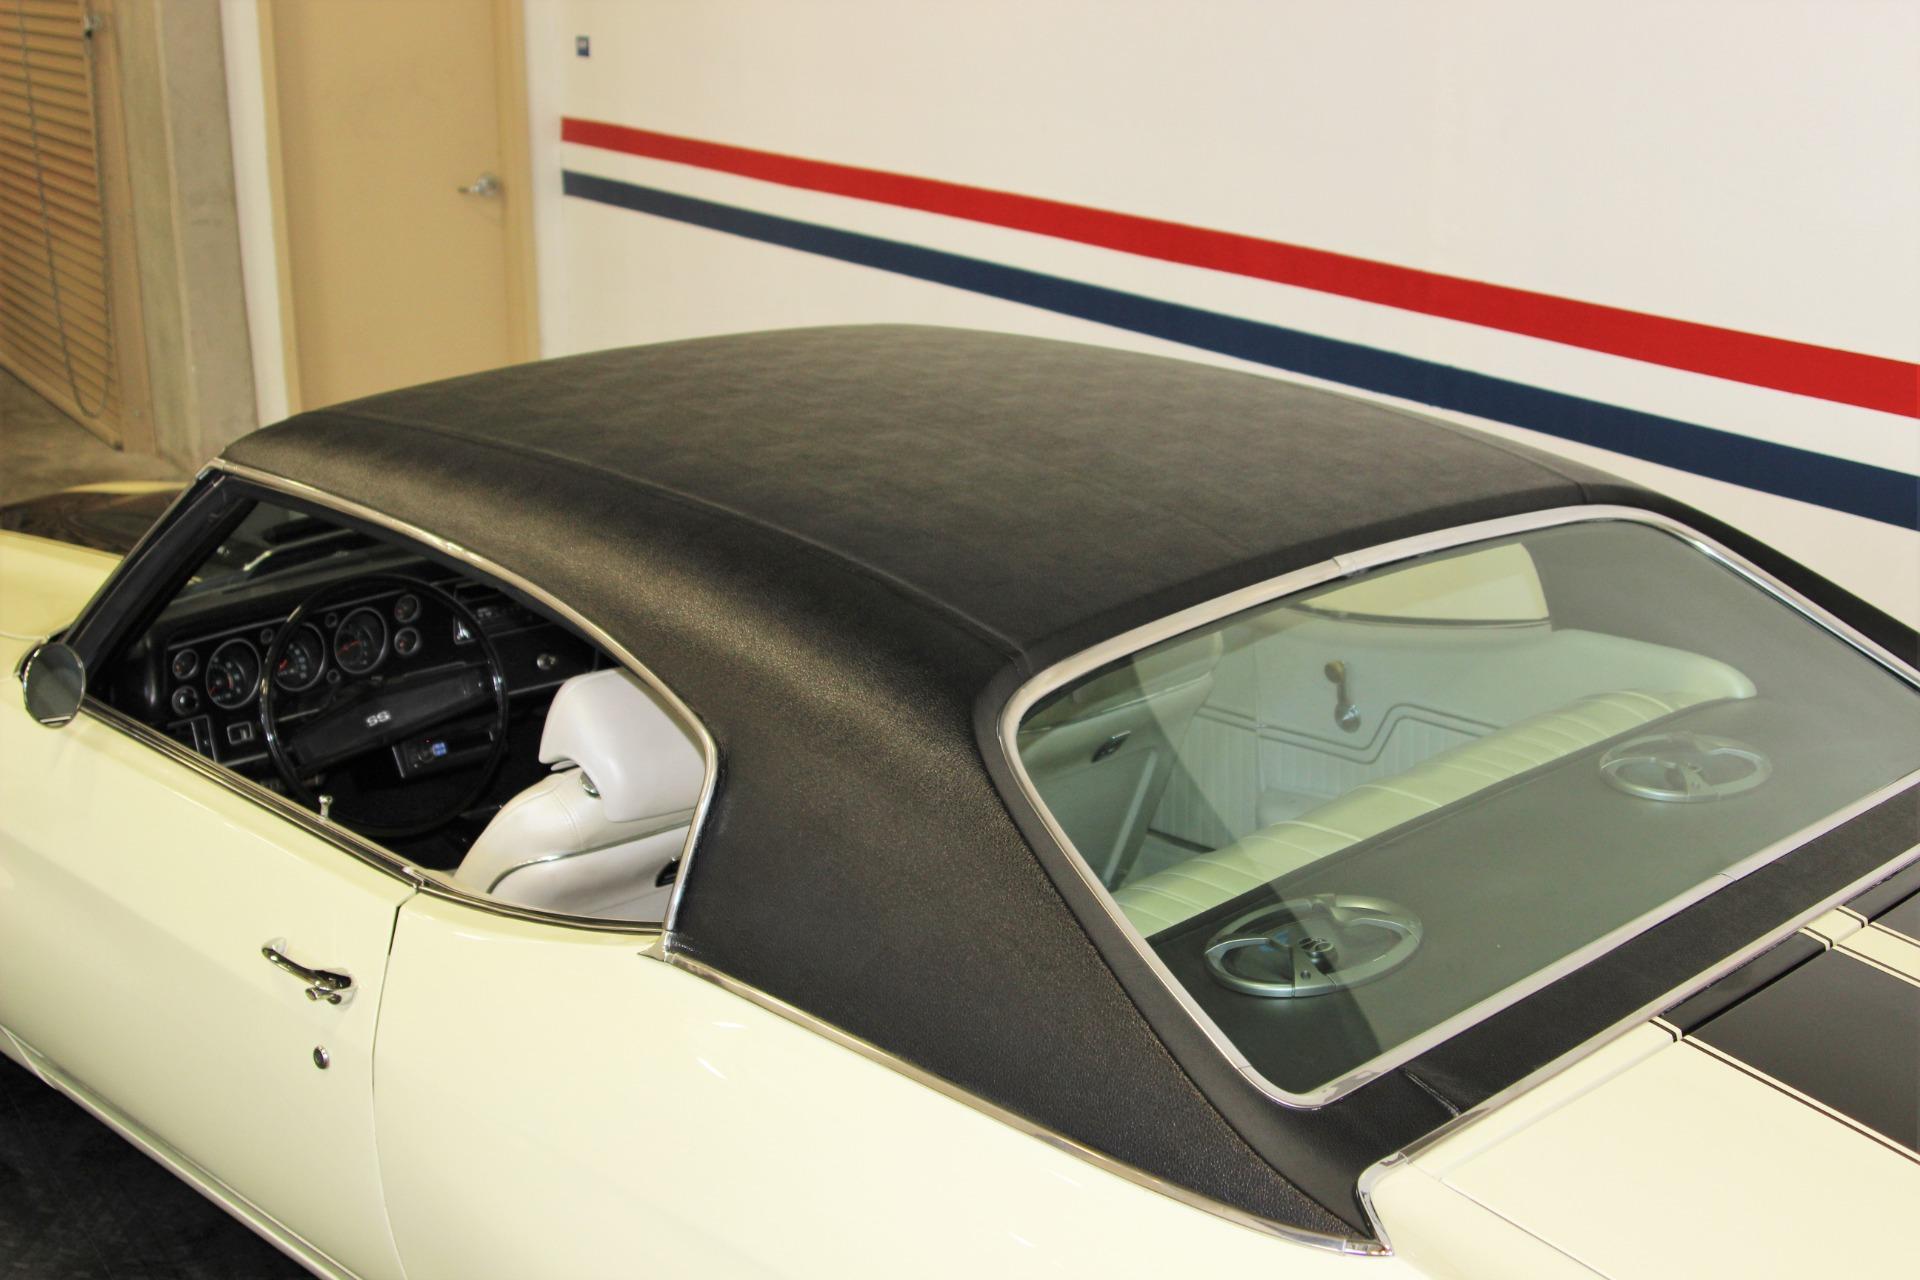 Used-1970-Chevrolet-Chevelle-Super-Sport-Tribute